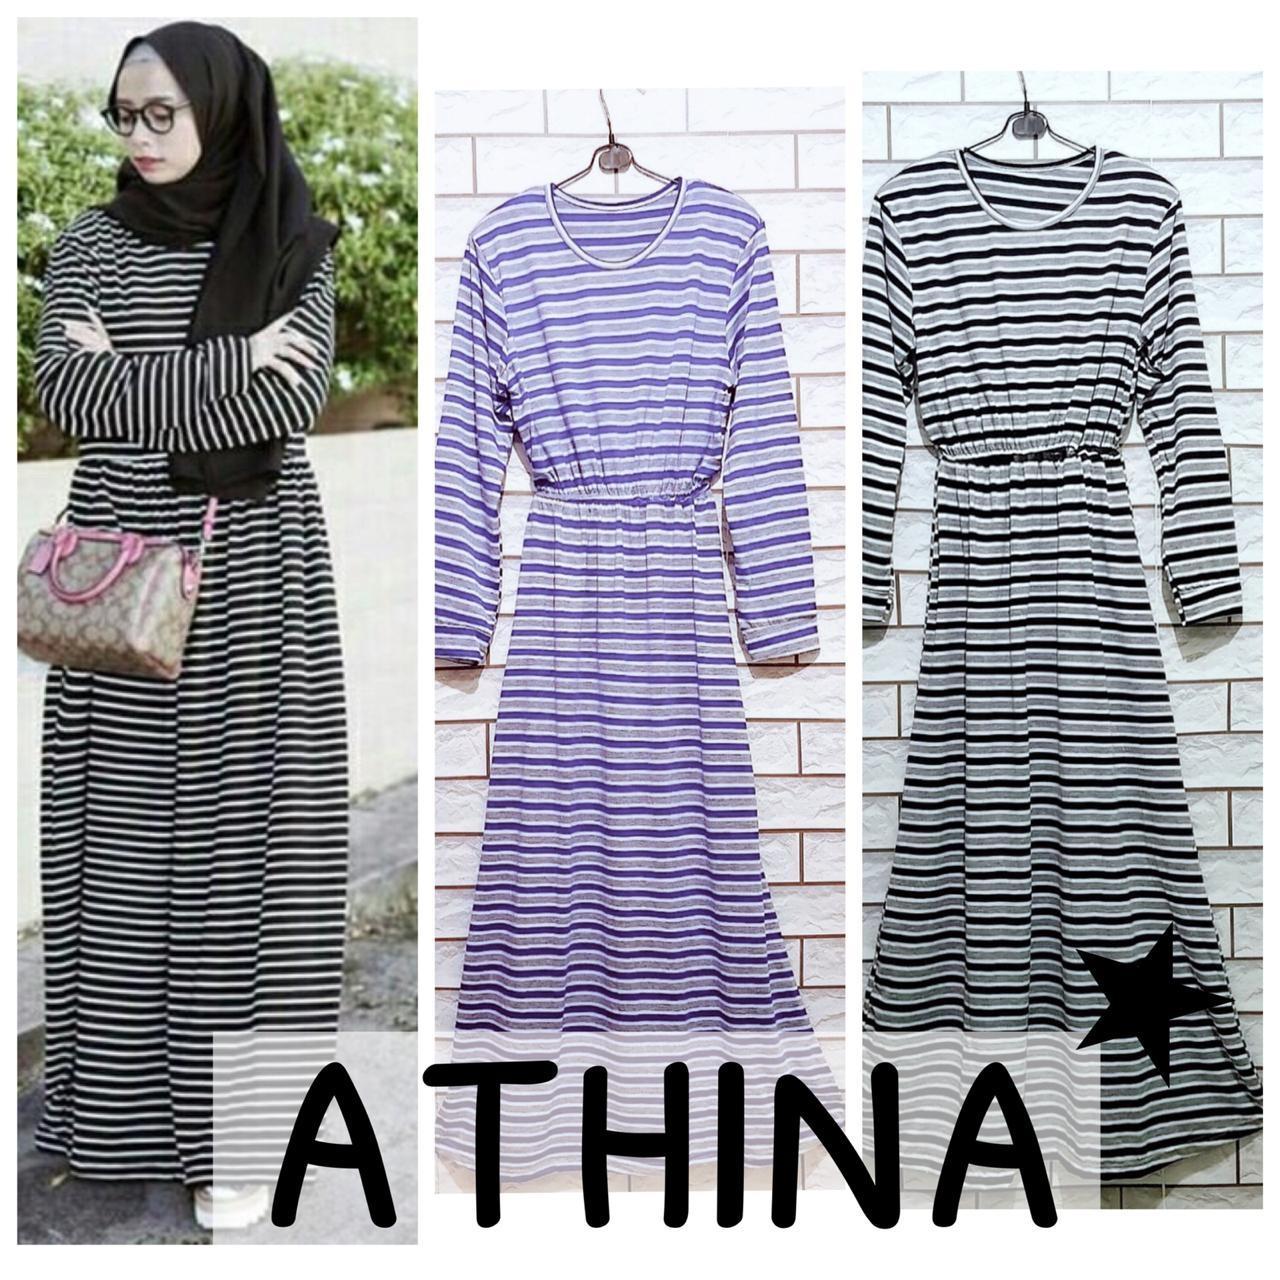 DAMAI FASHION JAKARTA - baju gamis muslim wanita Athina stripe - (tanpa hijab) konveksi tanah Abang